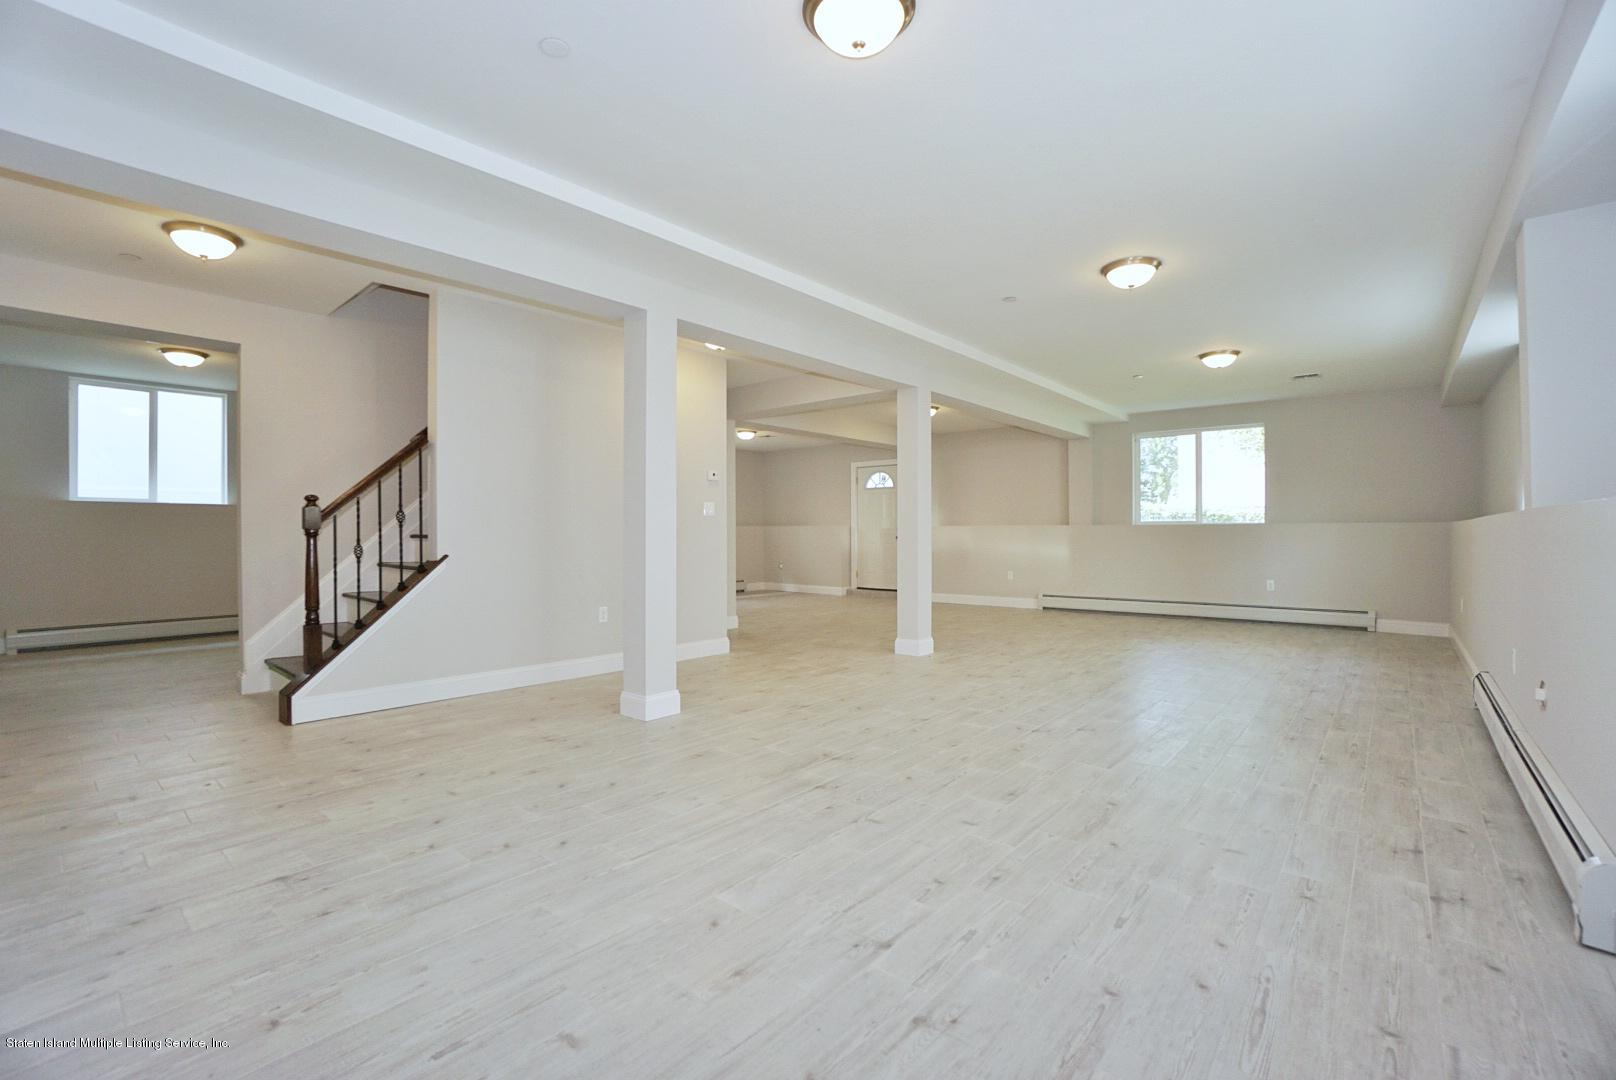 Single Family - Detached 170 Fairview Avenue  Staten Island, NY 10314, MLS-1126684-57